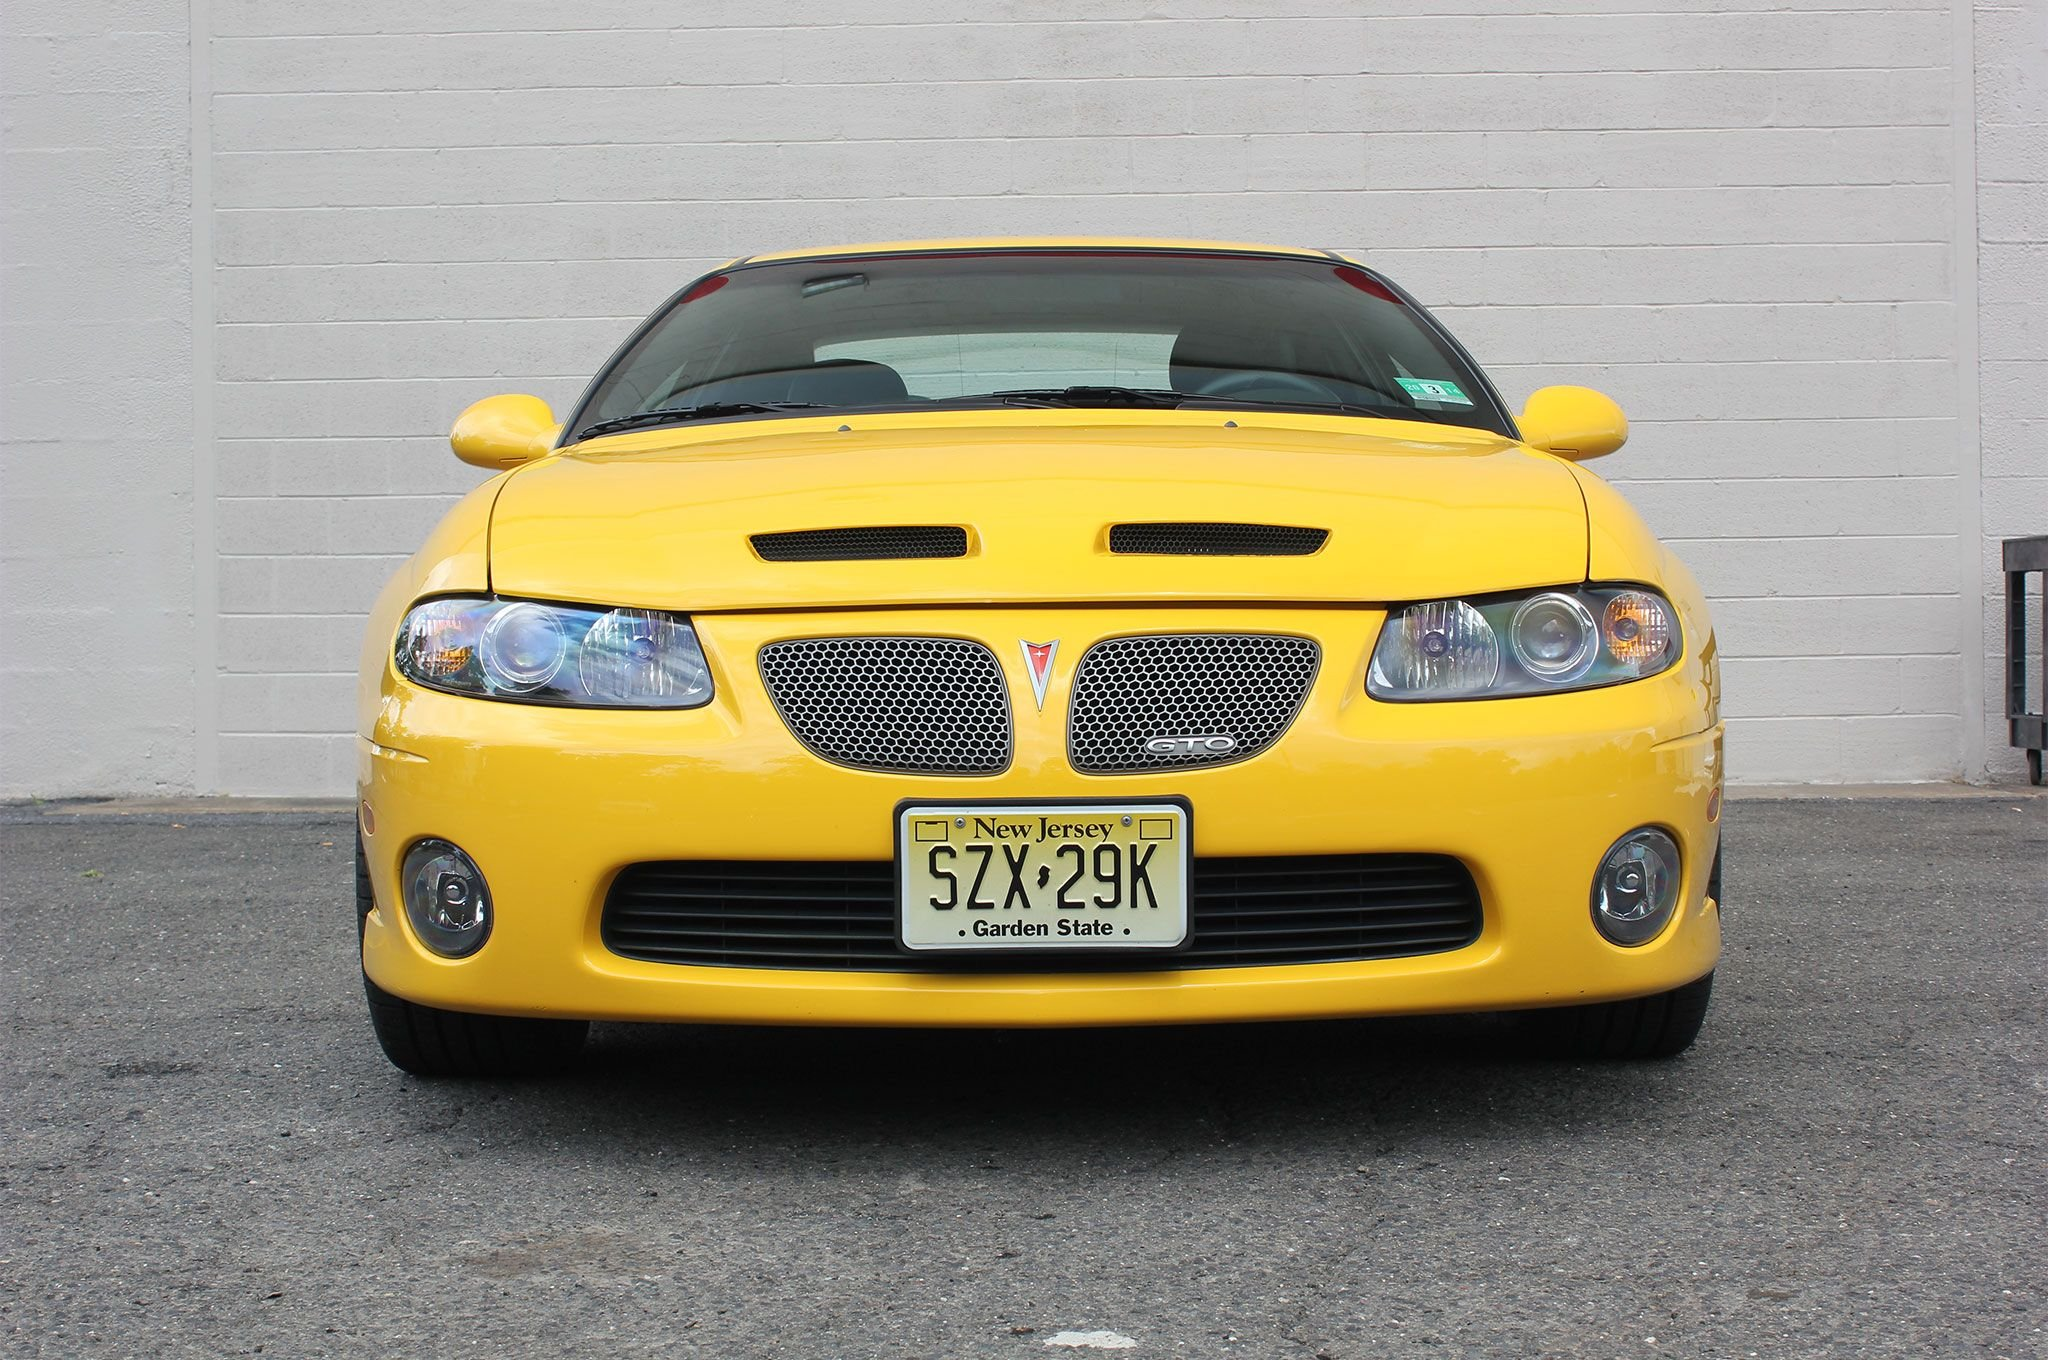 2004 Pontiac GTO-01 wallpaper